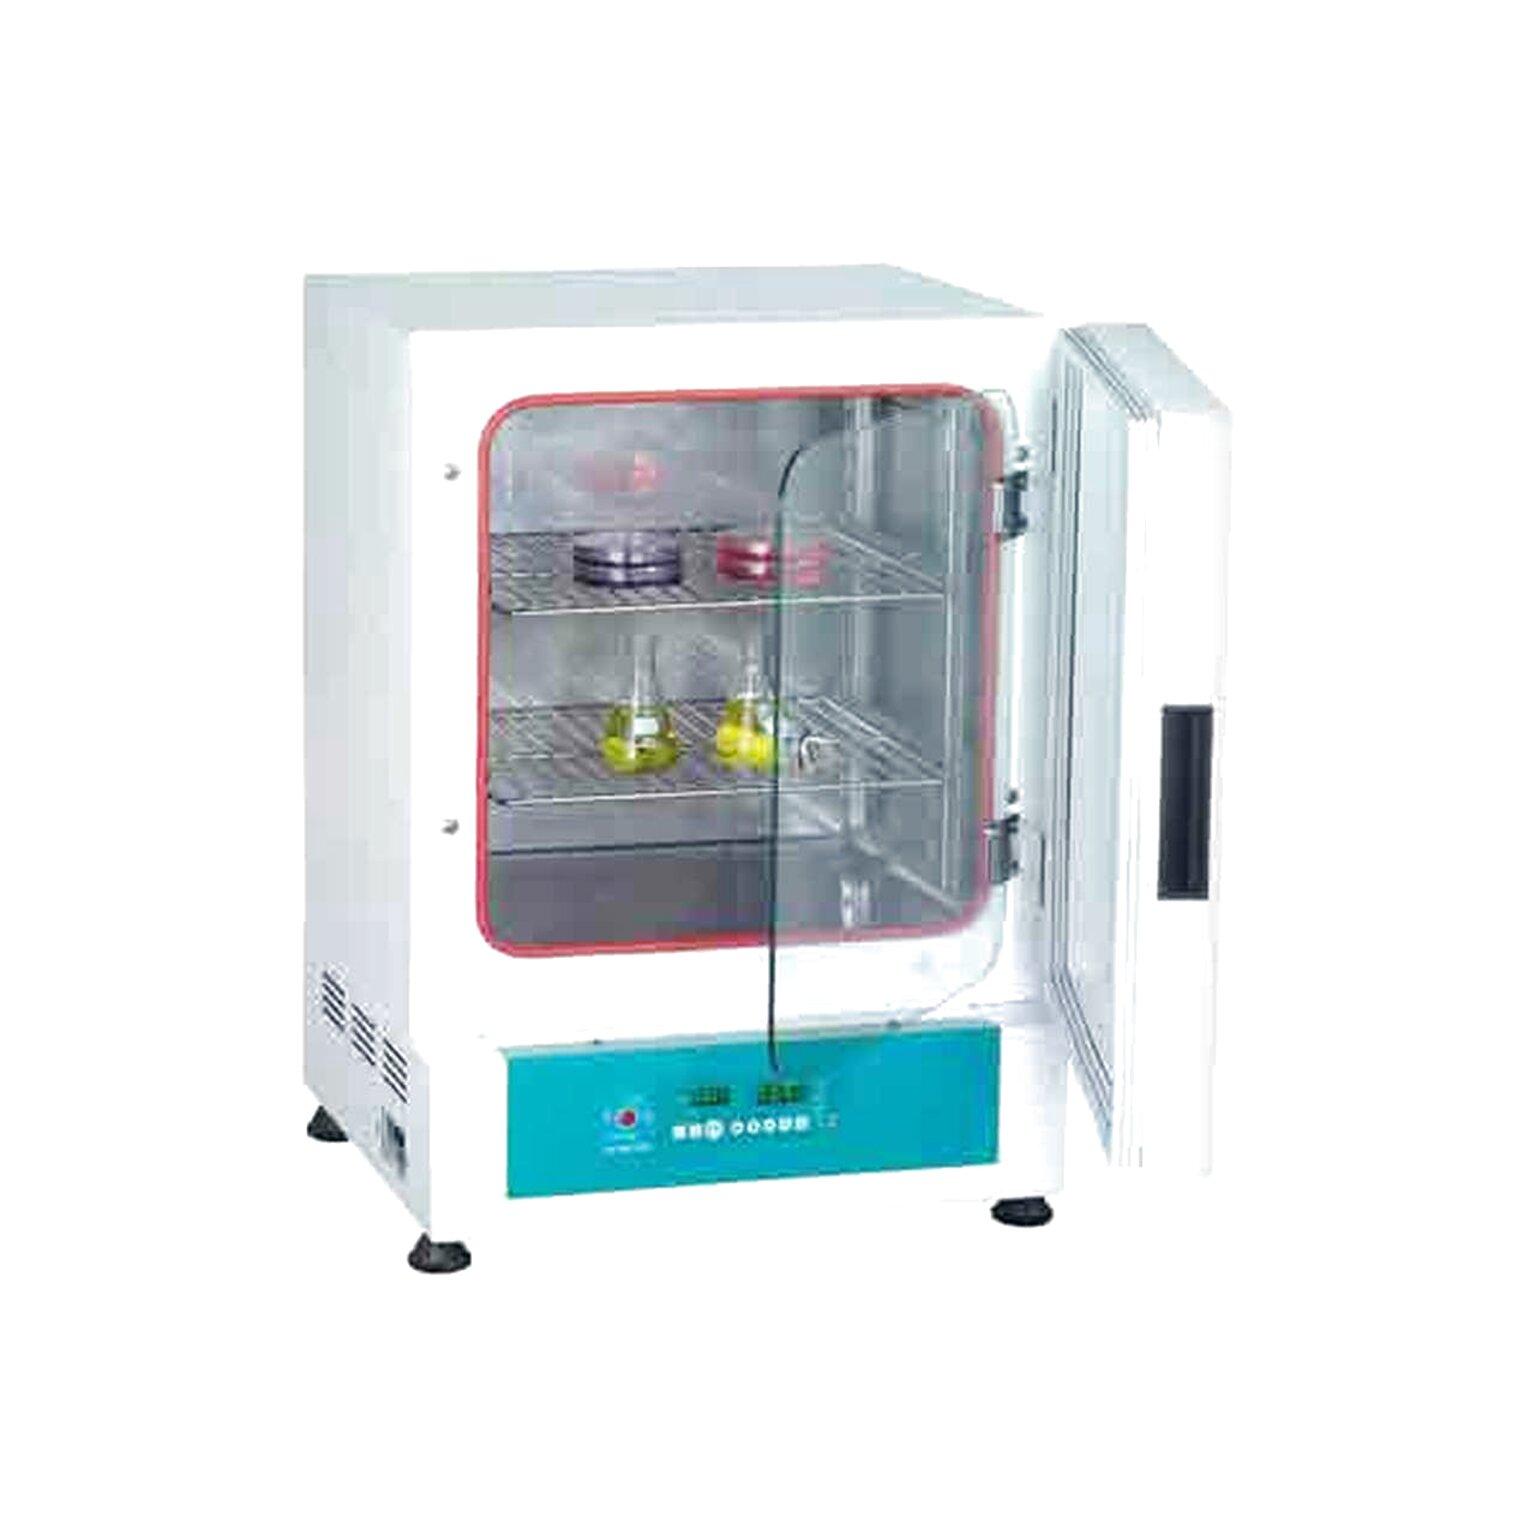 lab incubator for sale